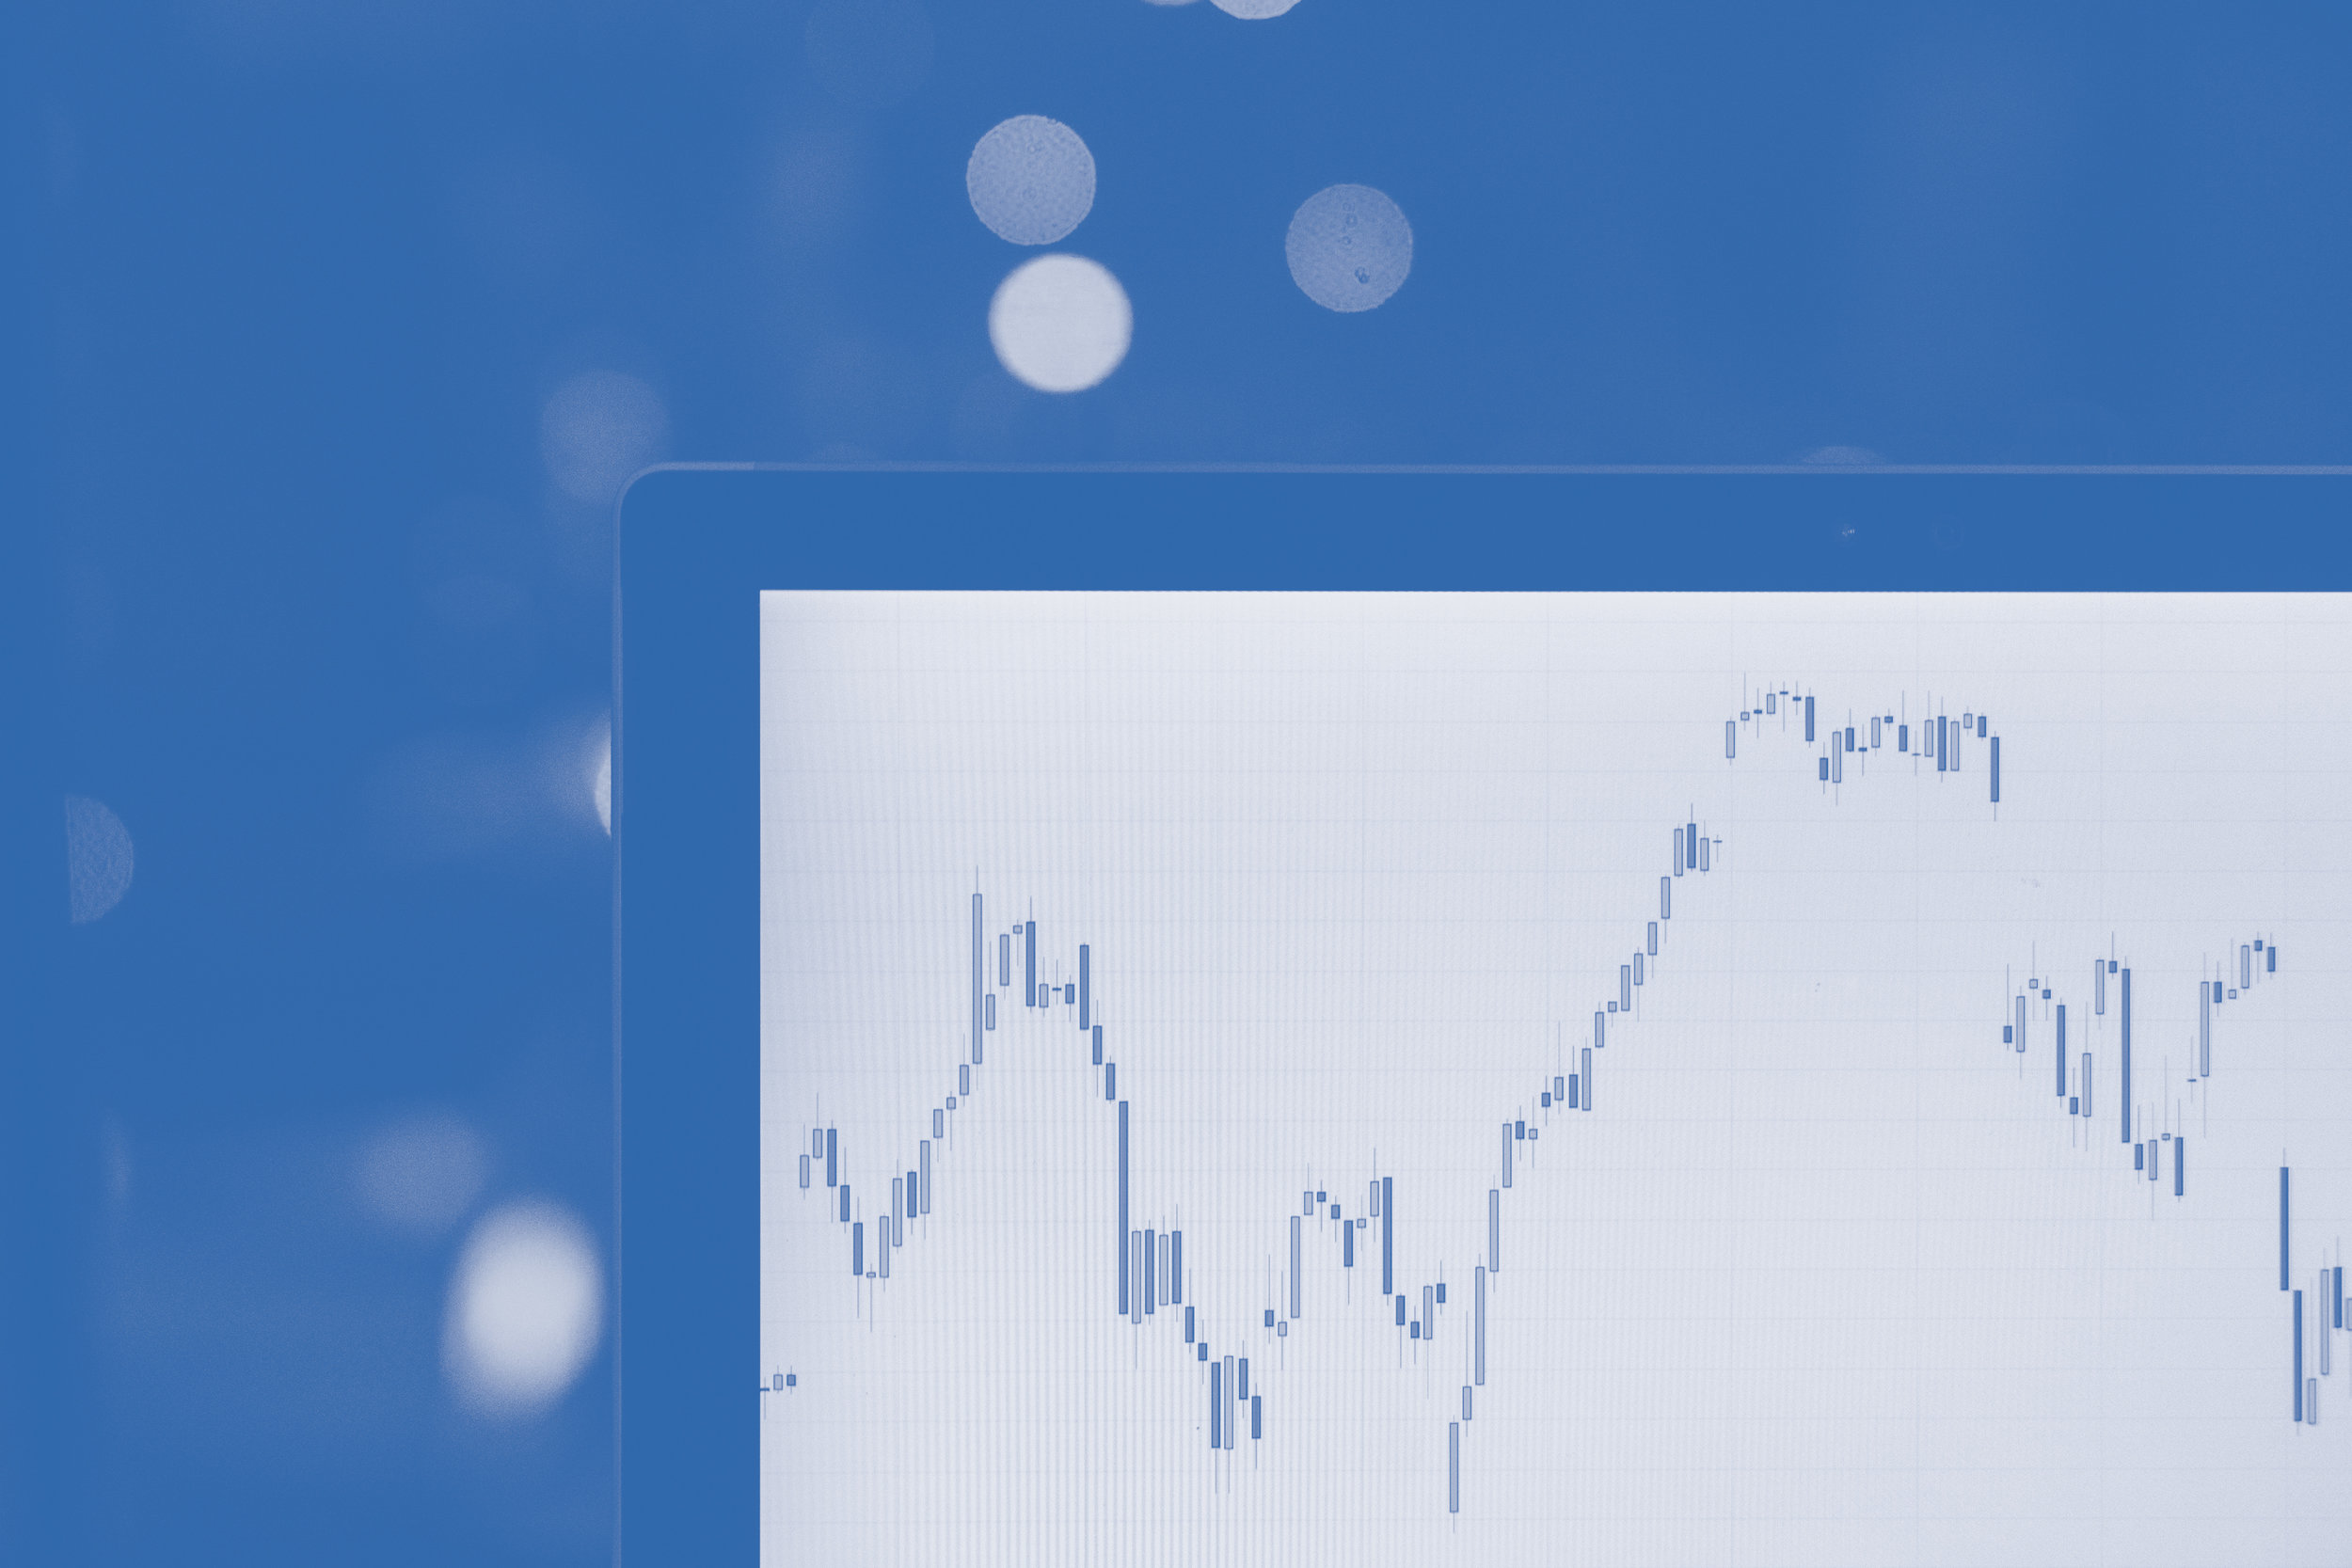 Finance_Blue.jpg